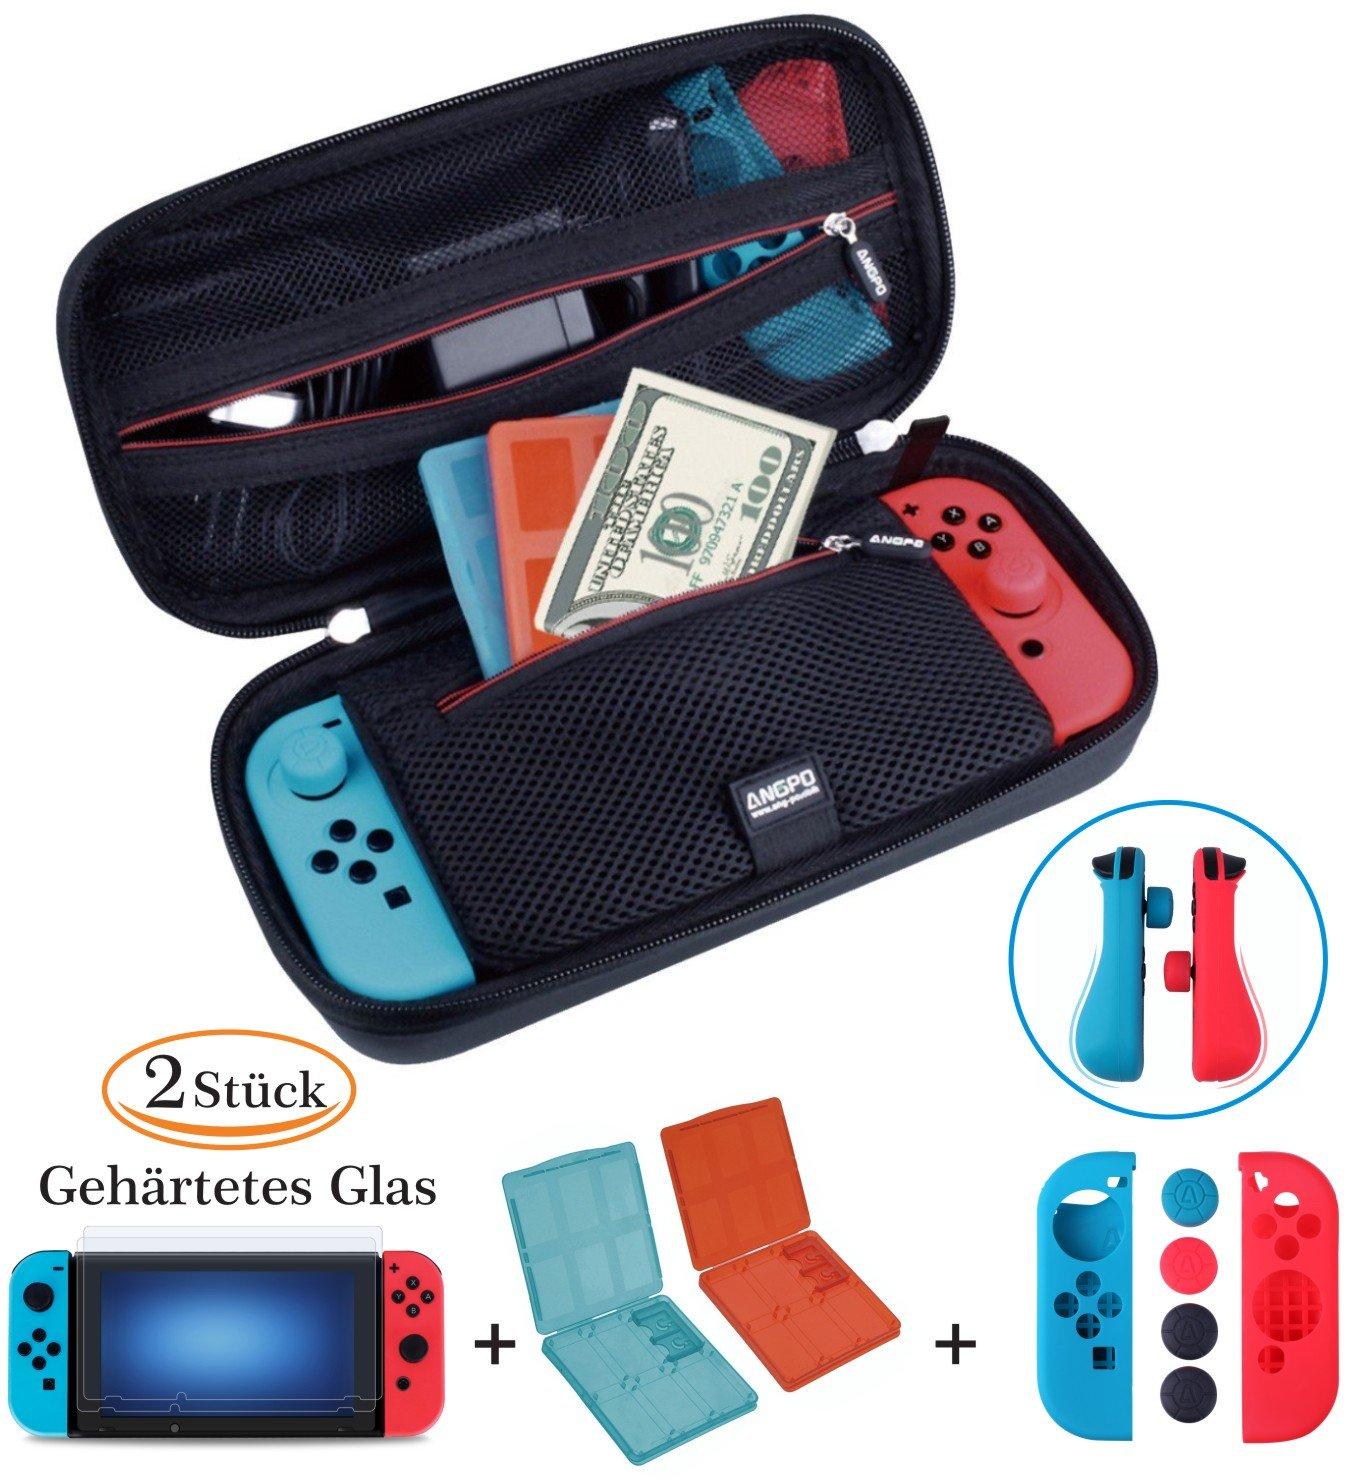 【Kit de la Caja Nintendo Switch】 Nintendo Switch, Estuche y...